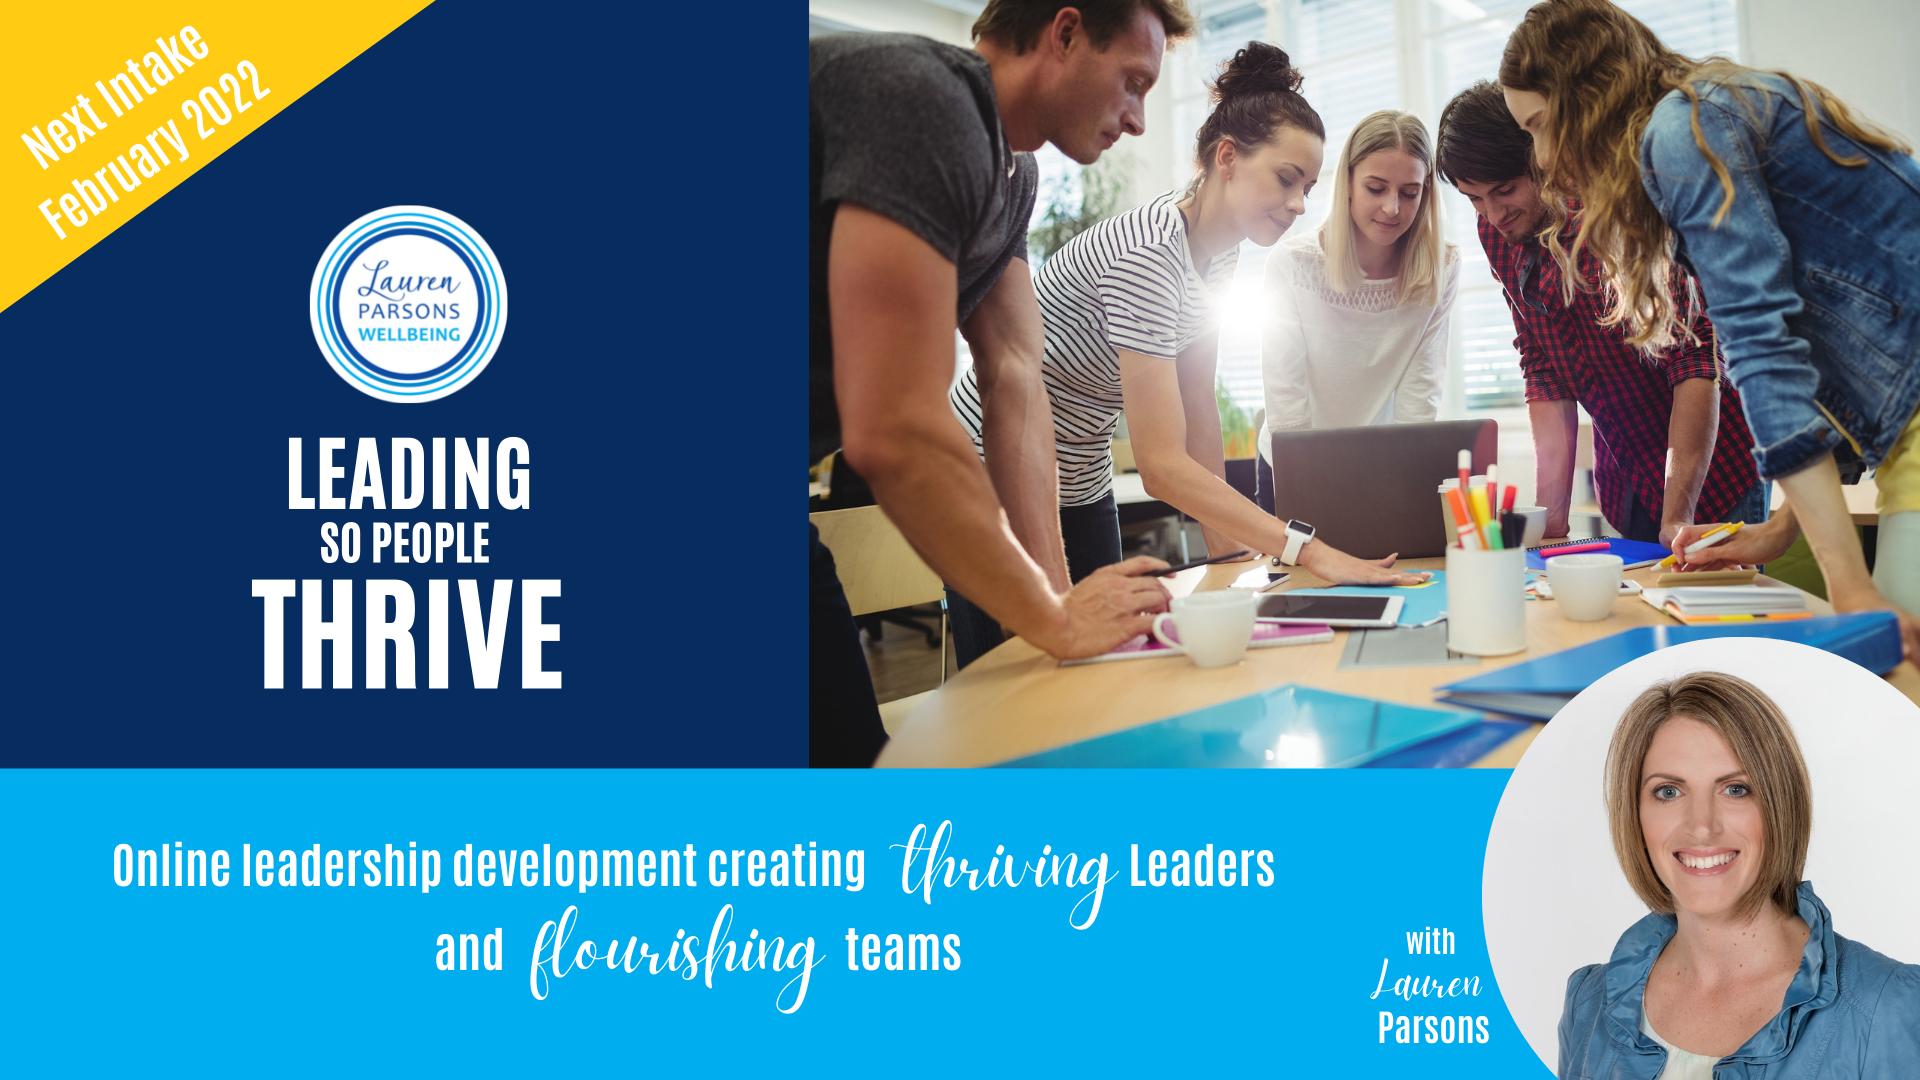 Leadership Training Health and Wellbeing Lauren Parsons